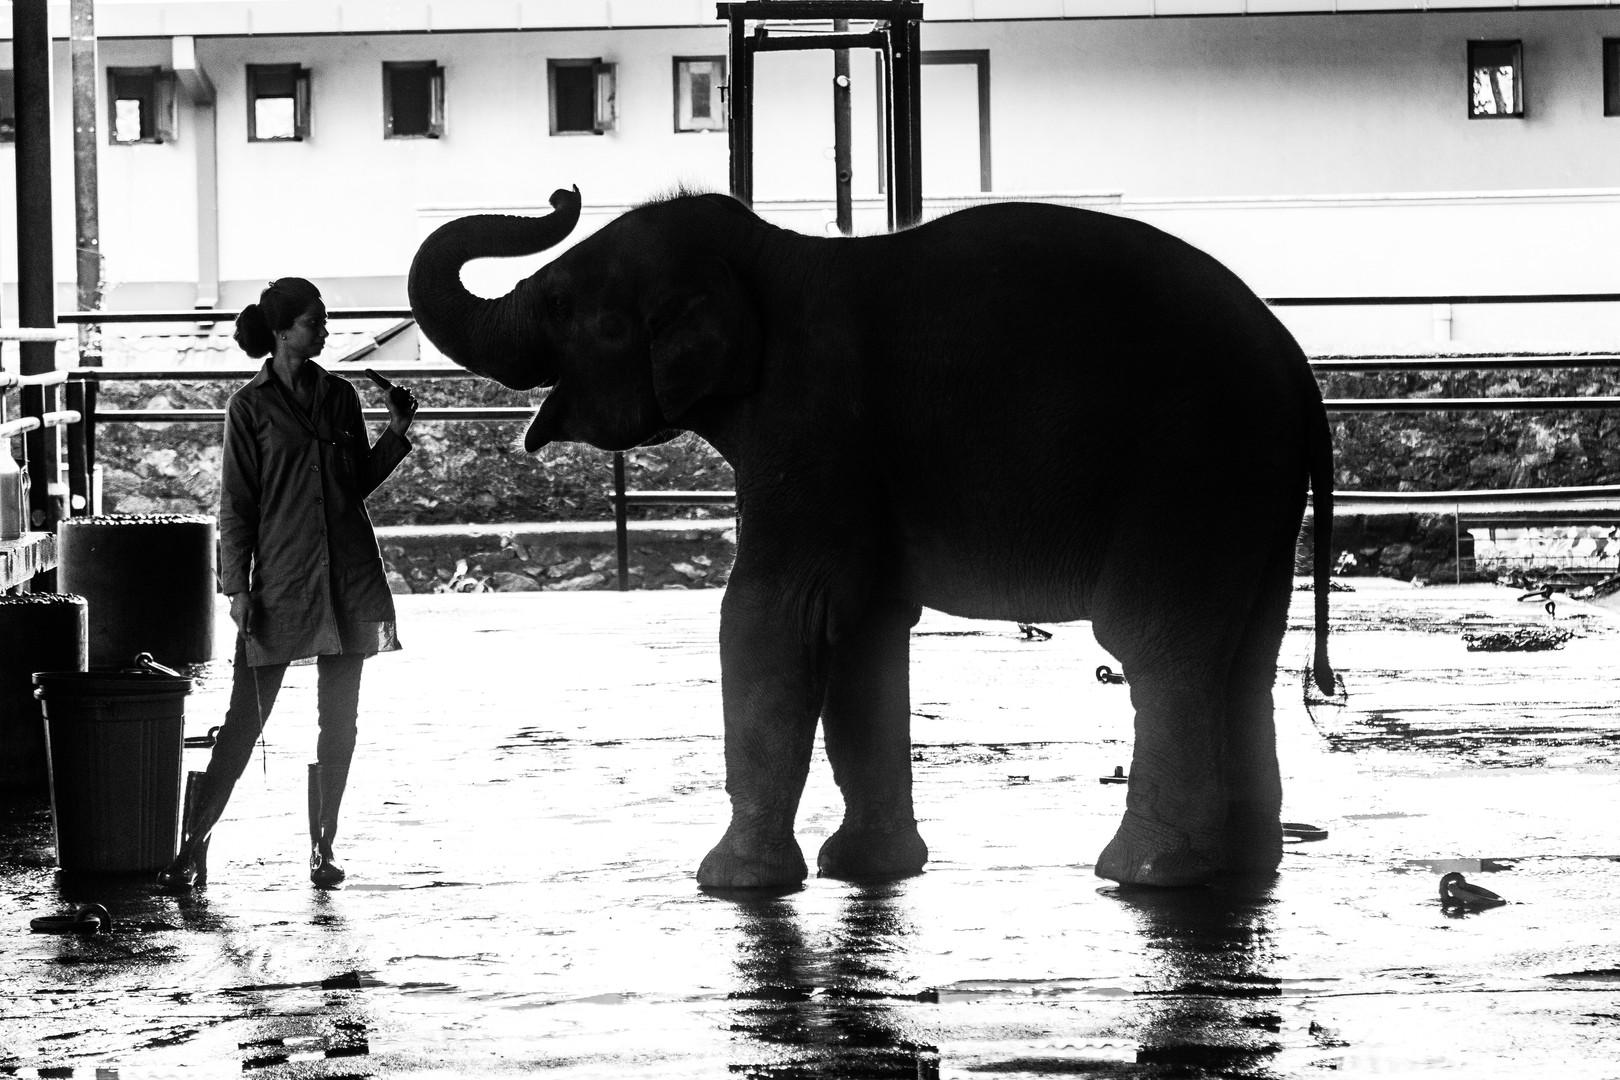 Sri Lanka 2017